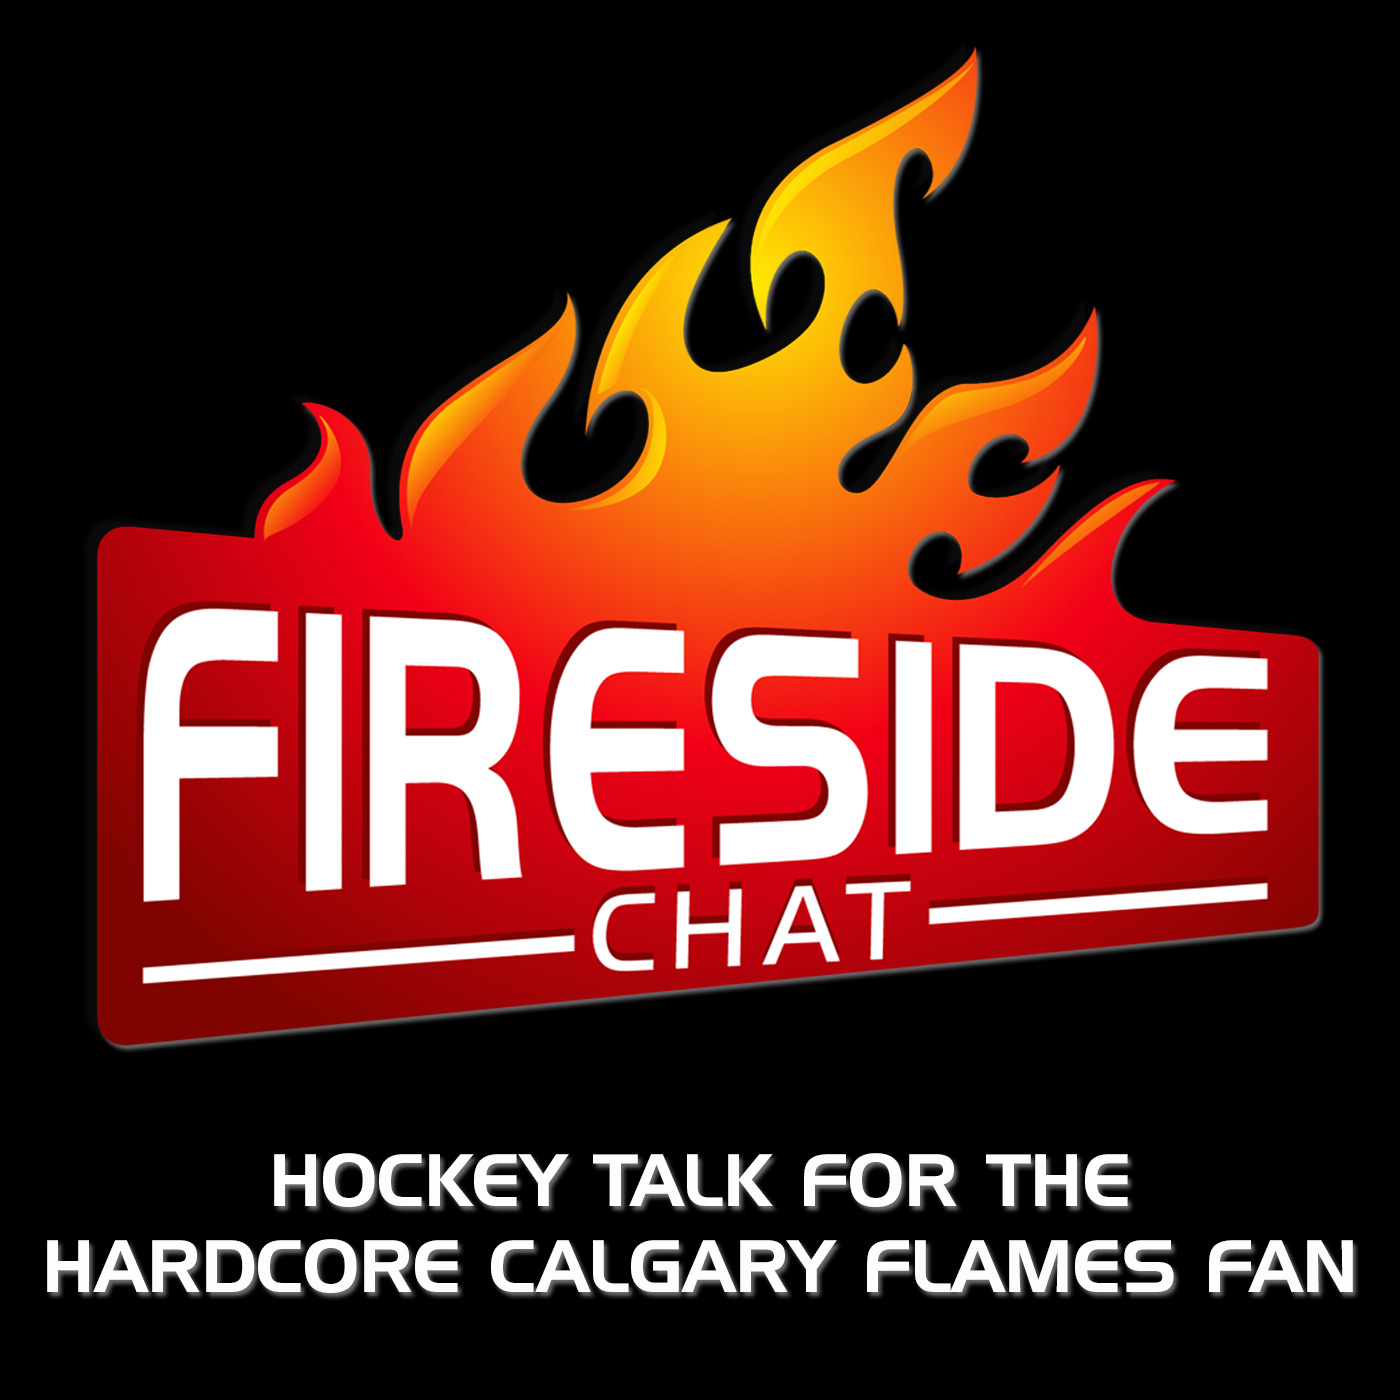 Fireside Chat - Hockey Talk for Hardcore Flames Fans